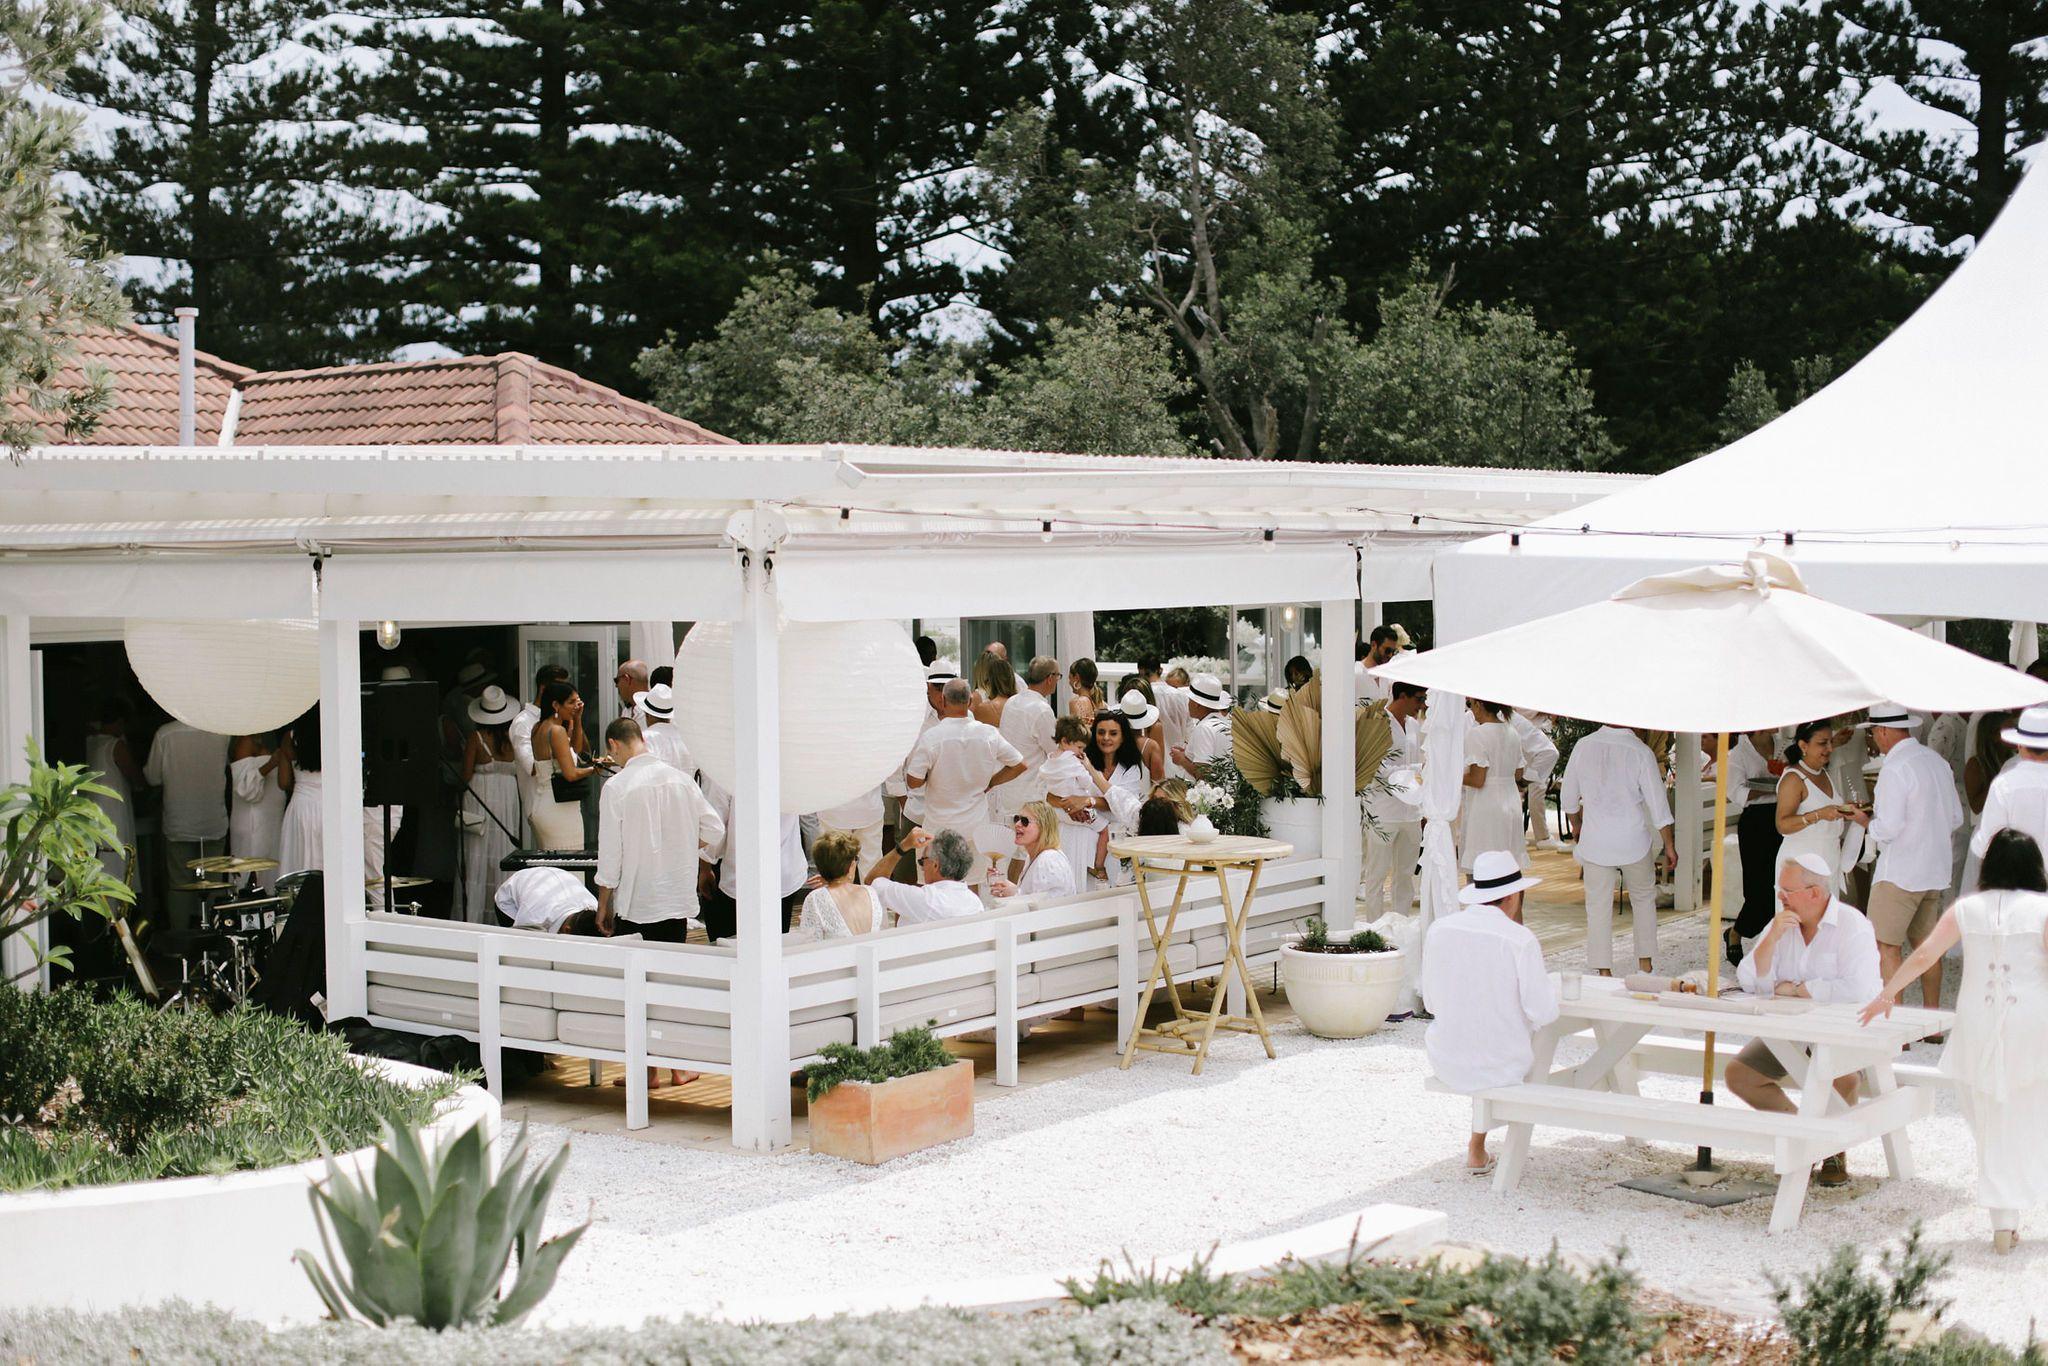 Sydney Wedding Venue Dunes Palm Beach In 2020 Coastal Wedding Venues Palm Beach Wedding Palm Beach Sydney